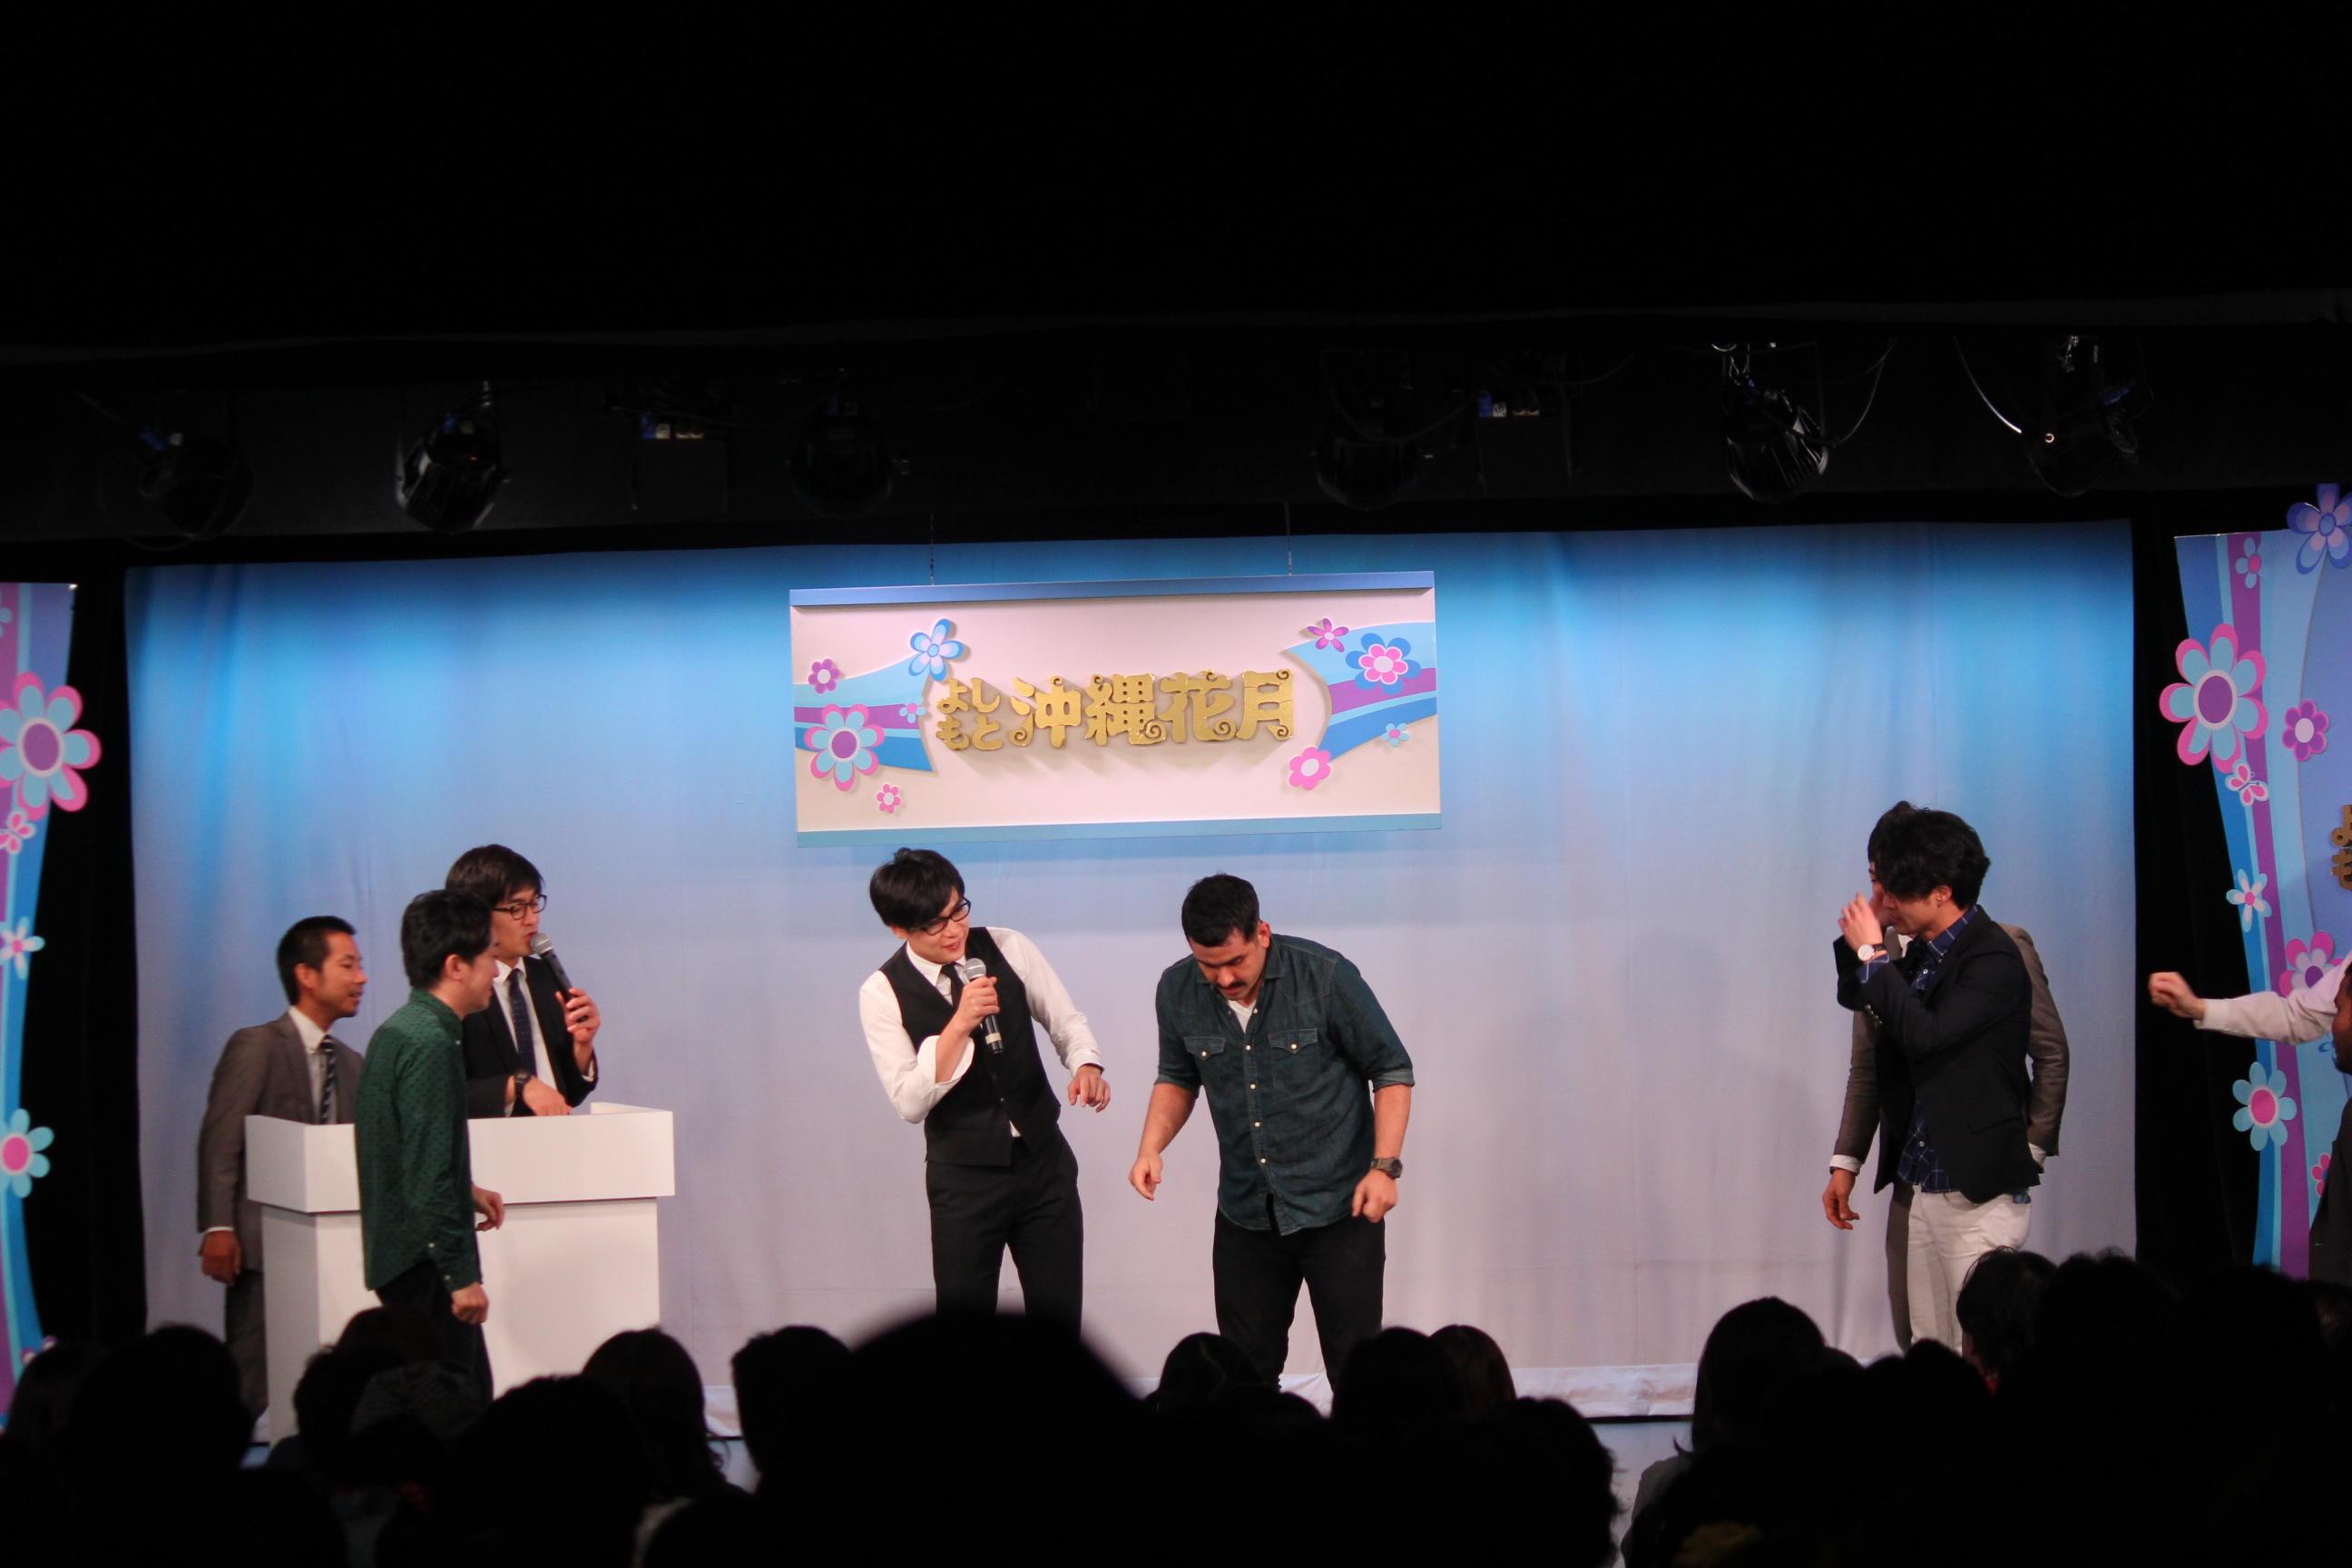 http://news.yoshimoto.co.jp/20151231210315-1c05074caf55036eca26d2a309efb36248050f60.jpg